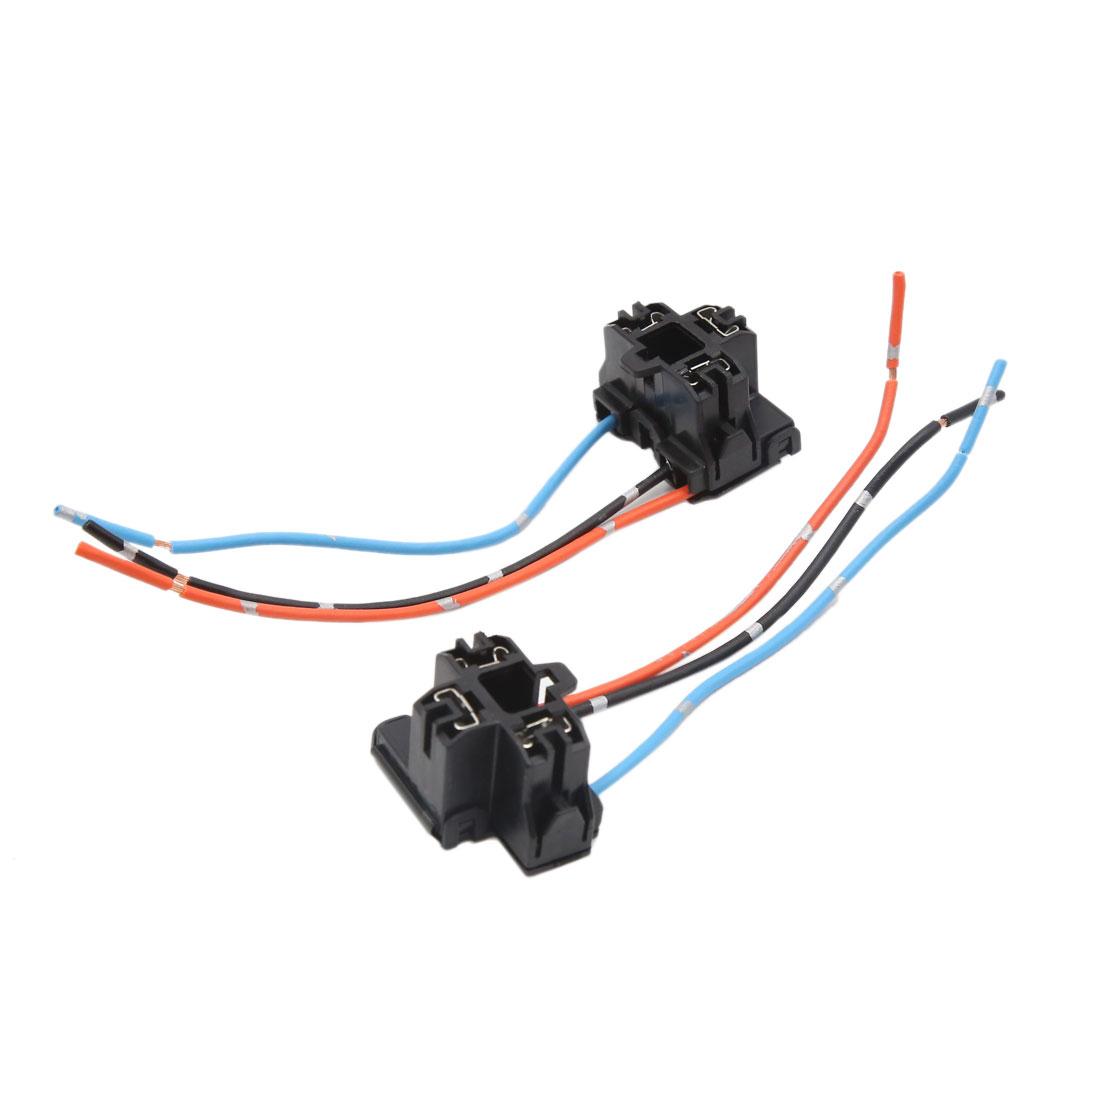 2pcs Plastic 3 Terminal Car H4 Headlight Fog Lamp Bulb Wiring Harness Socket Connector